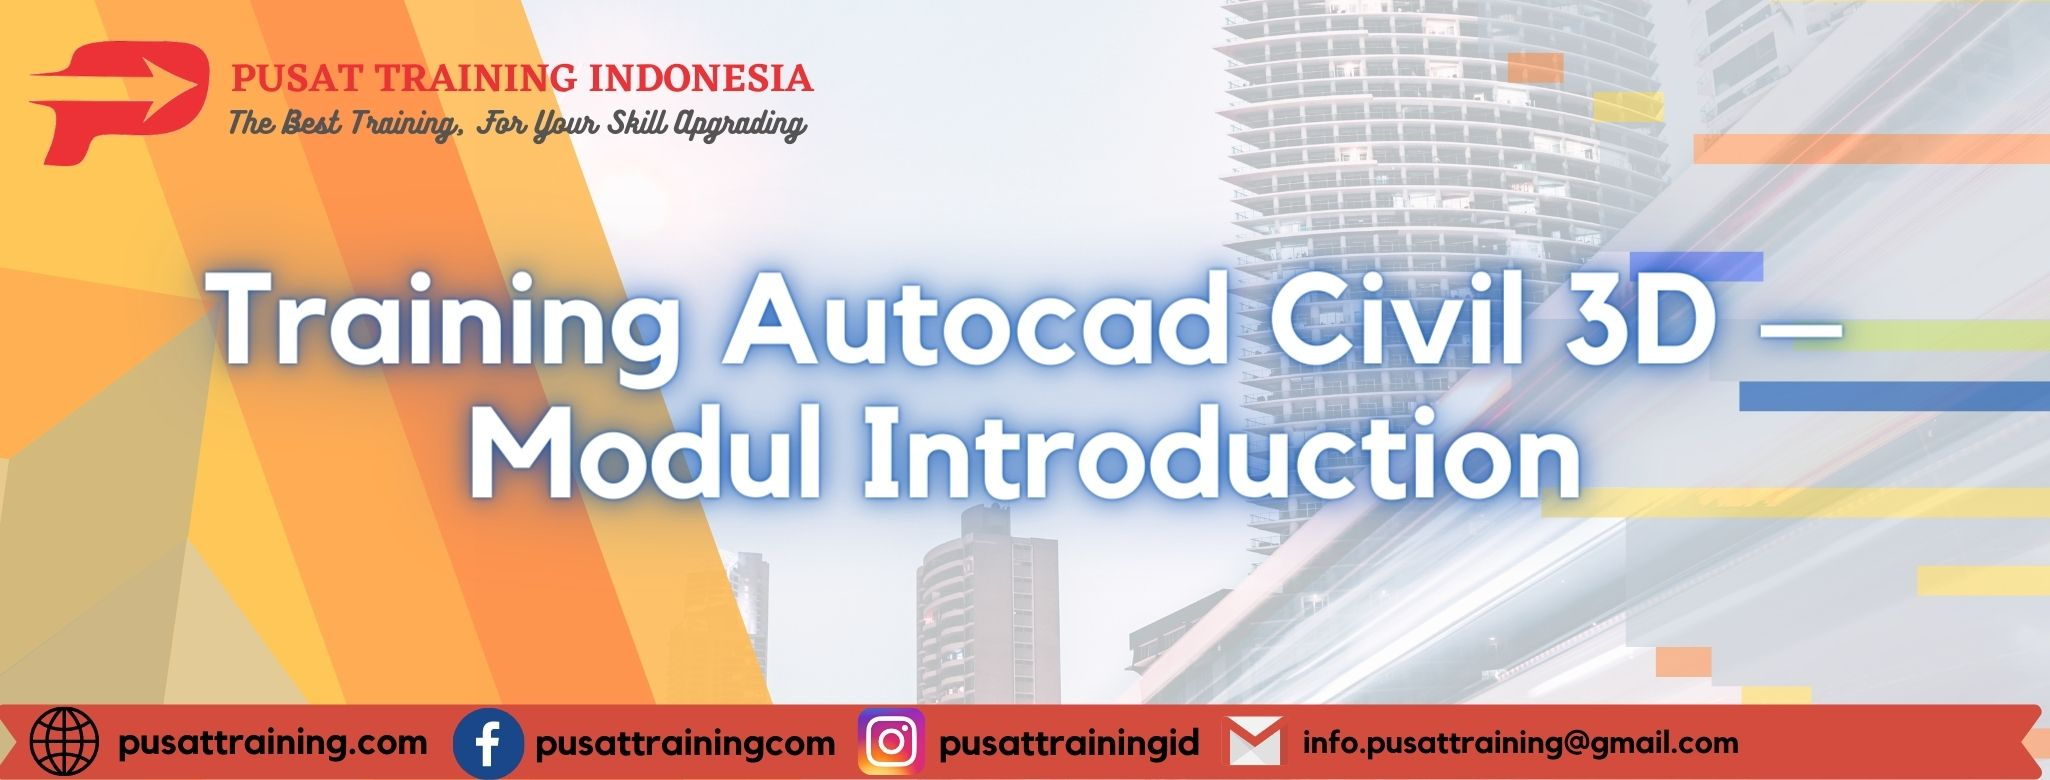 Training-Autocad-Civil-3D-Modul-Introduction